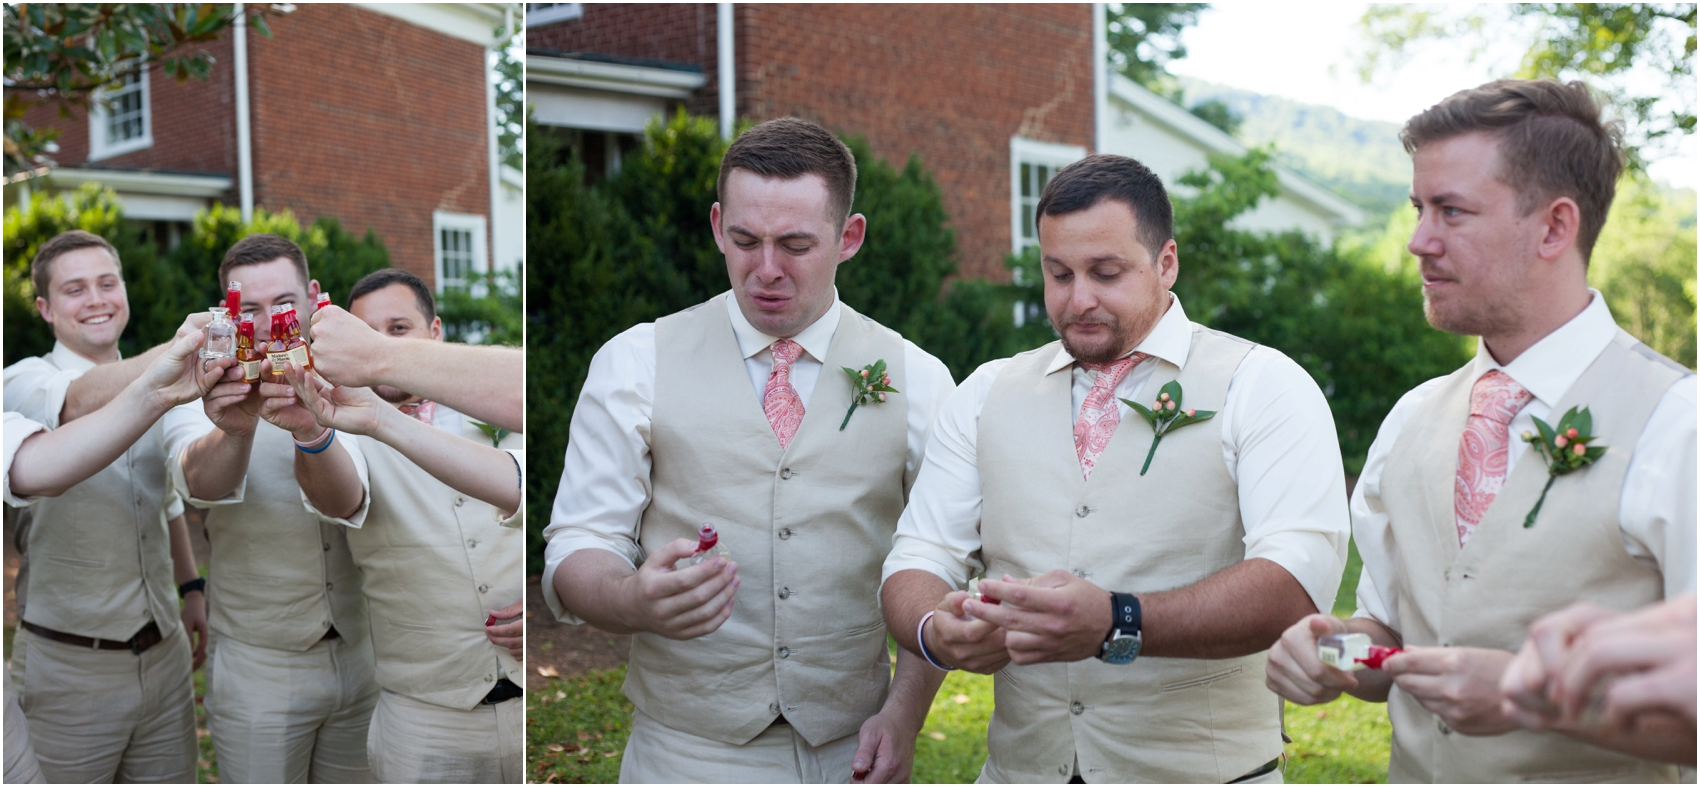 Rodes Farm Charlottesville VA Wedding-3-7.jpg